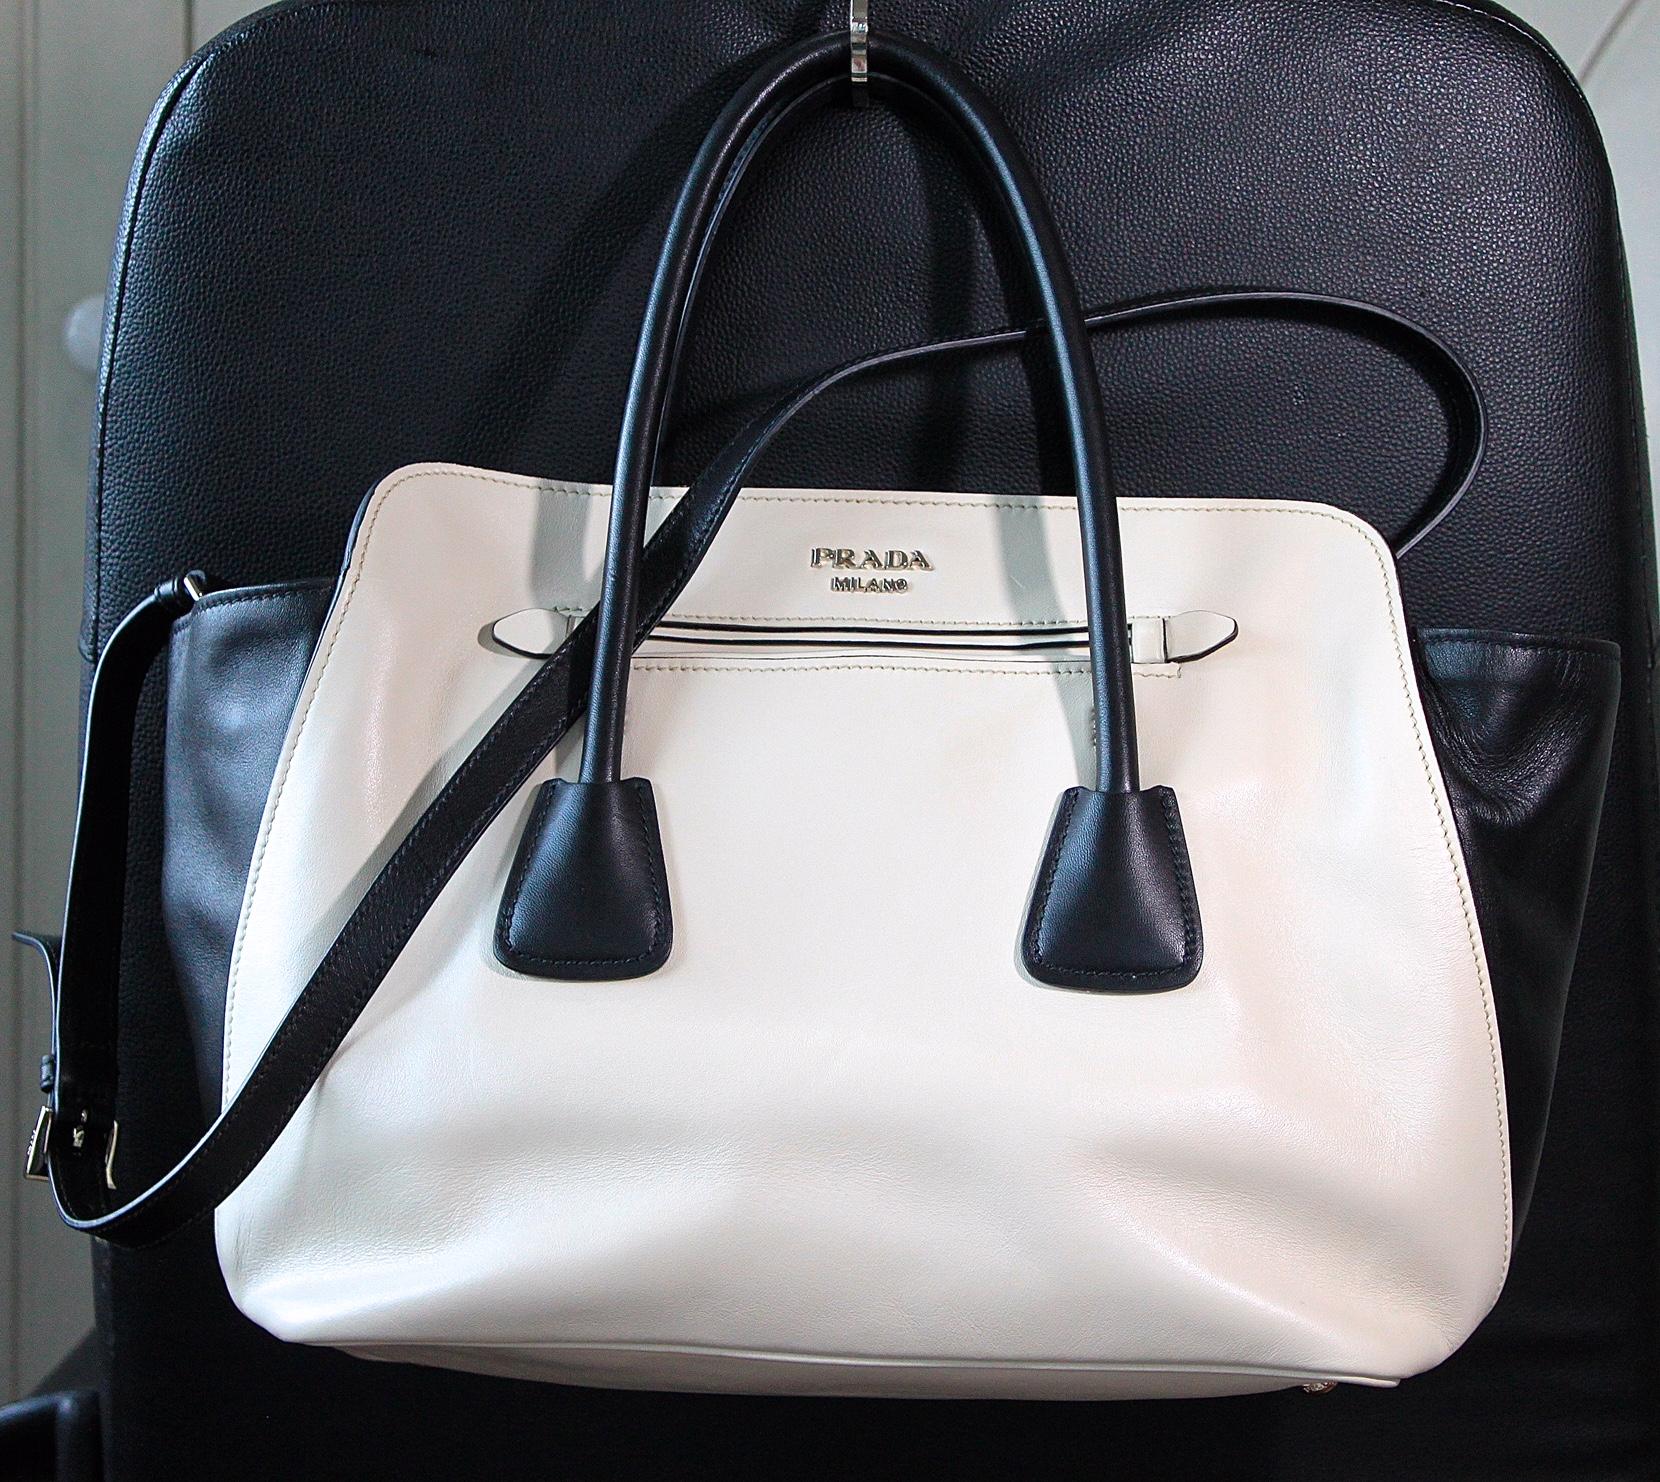 Genuine Prada 2-way Tote Bag PRADA 2WAY Tote TALCO+NERO BN2611